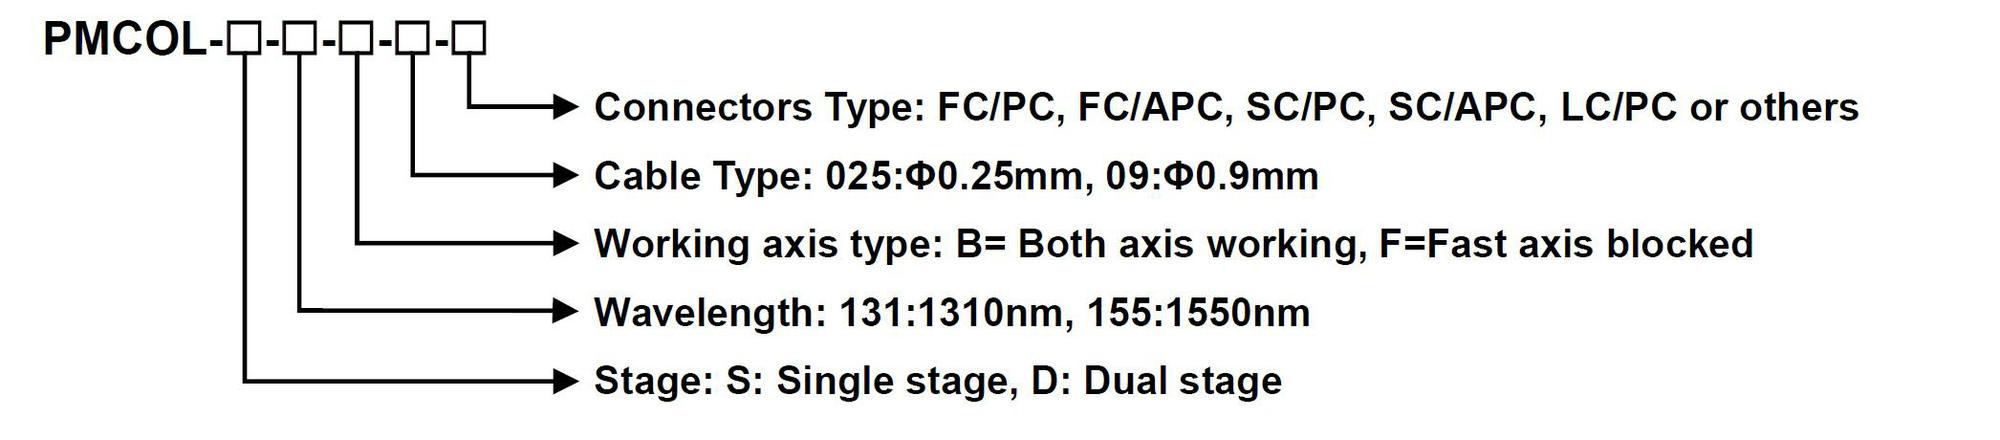 1.4.5 PM Fiber Collimator